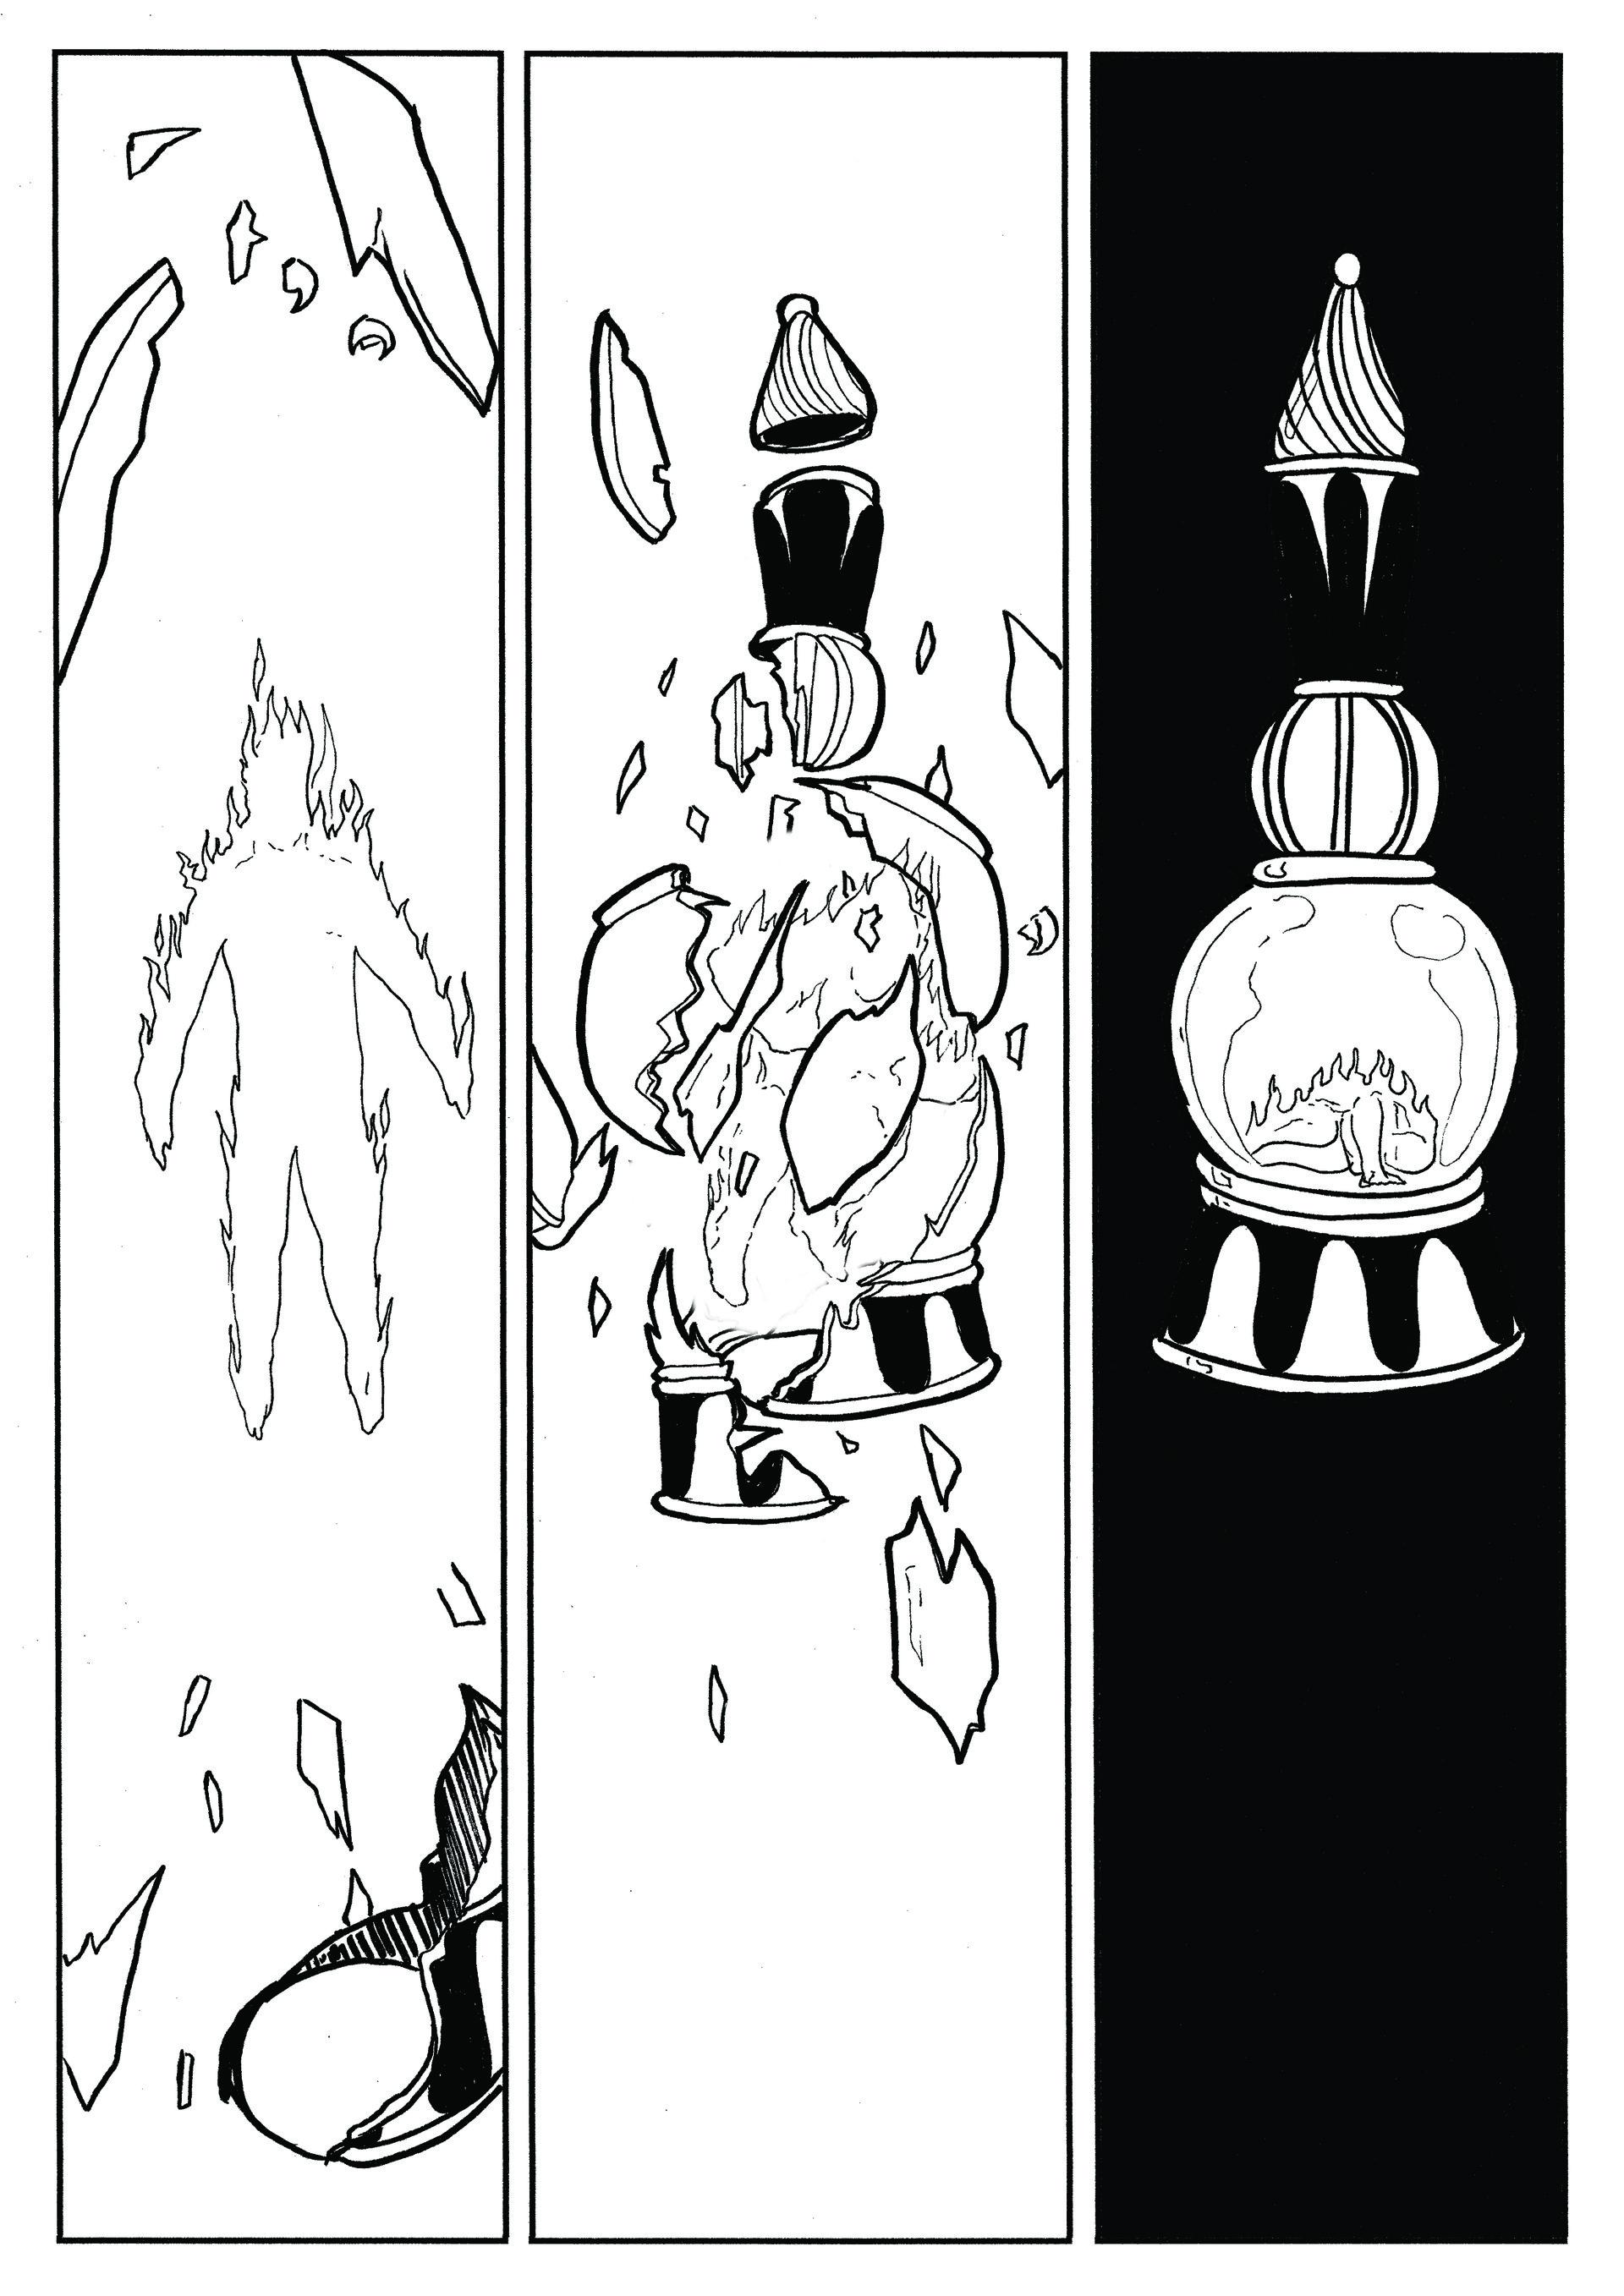 Elliot balson u page2 inks